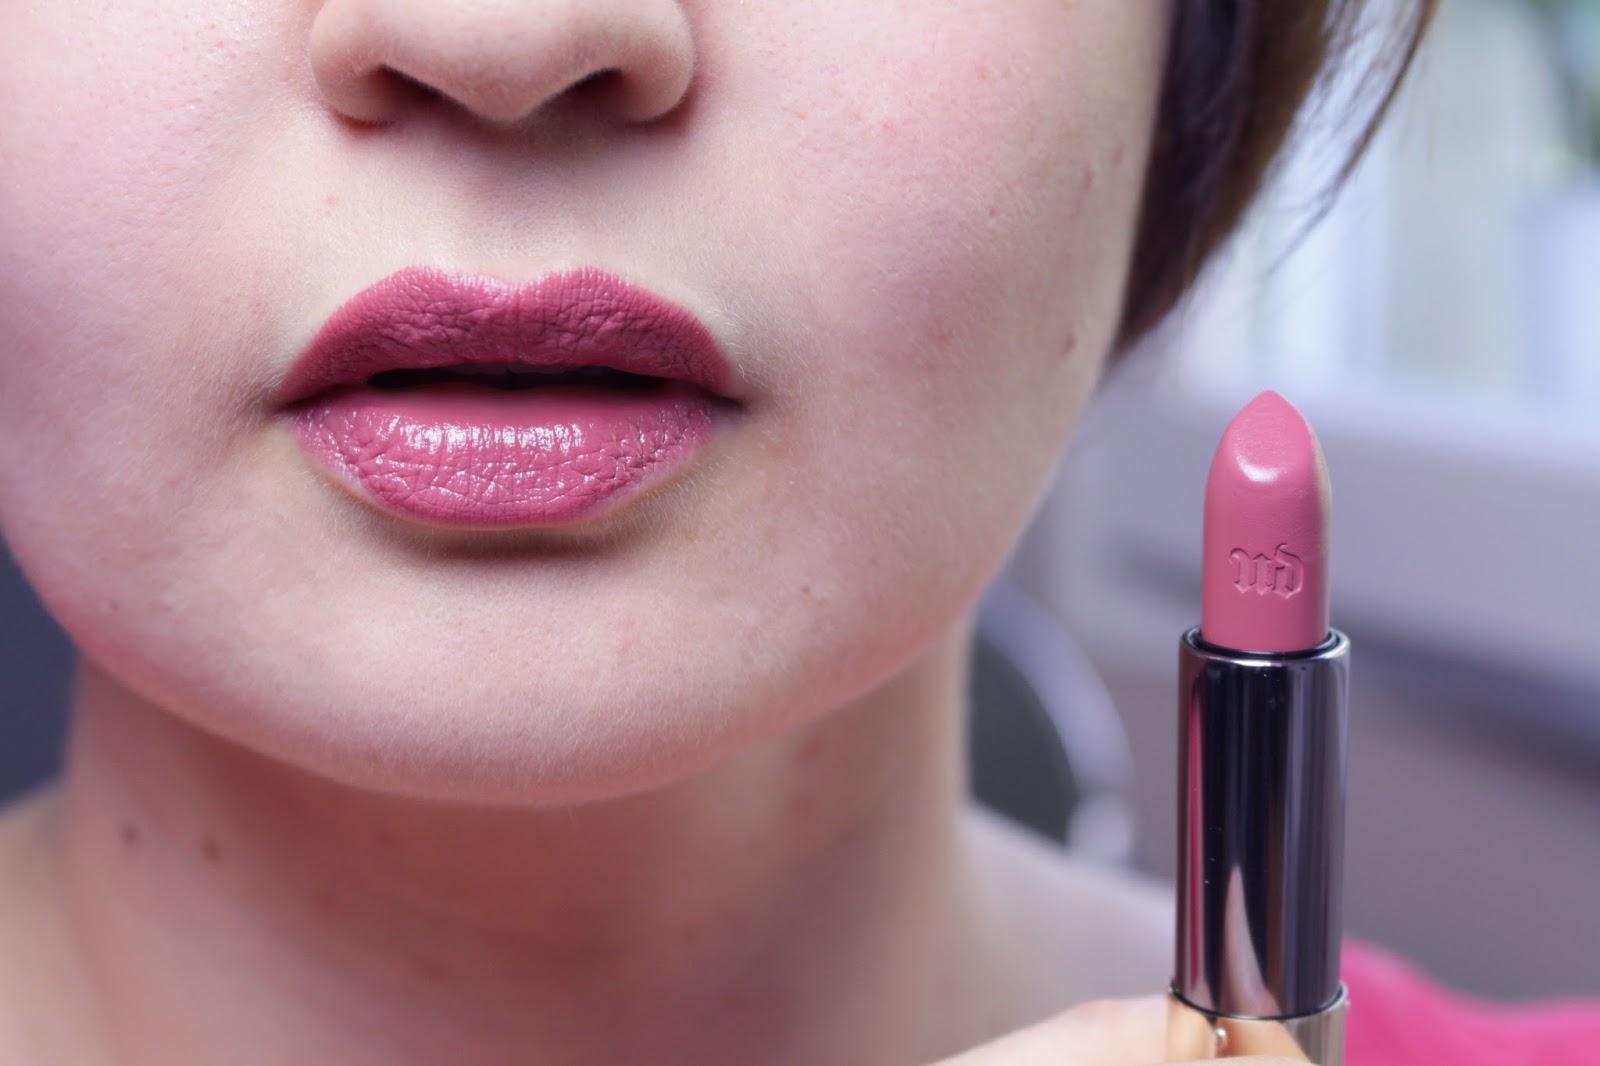 Urban Decay Vice Lipsticks